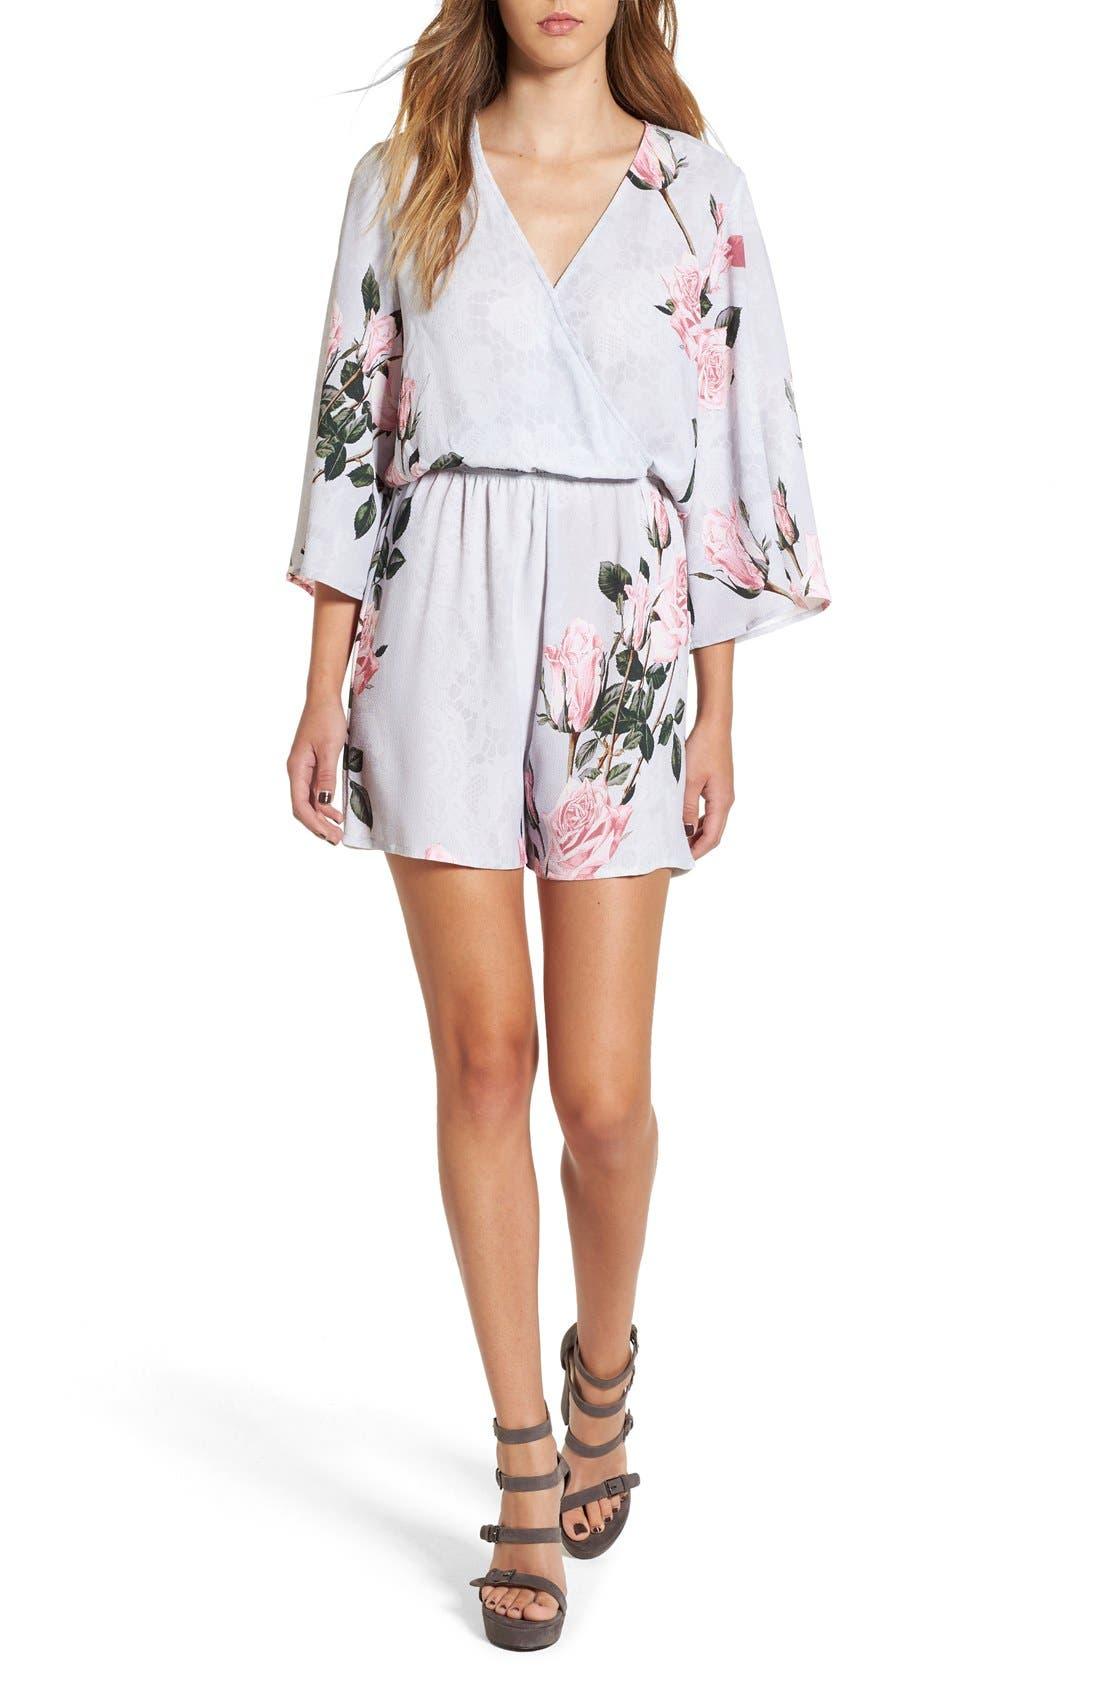 Main Image - Glamorous Floral Print Lace Kimono Romper